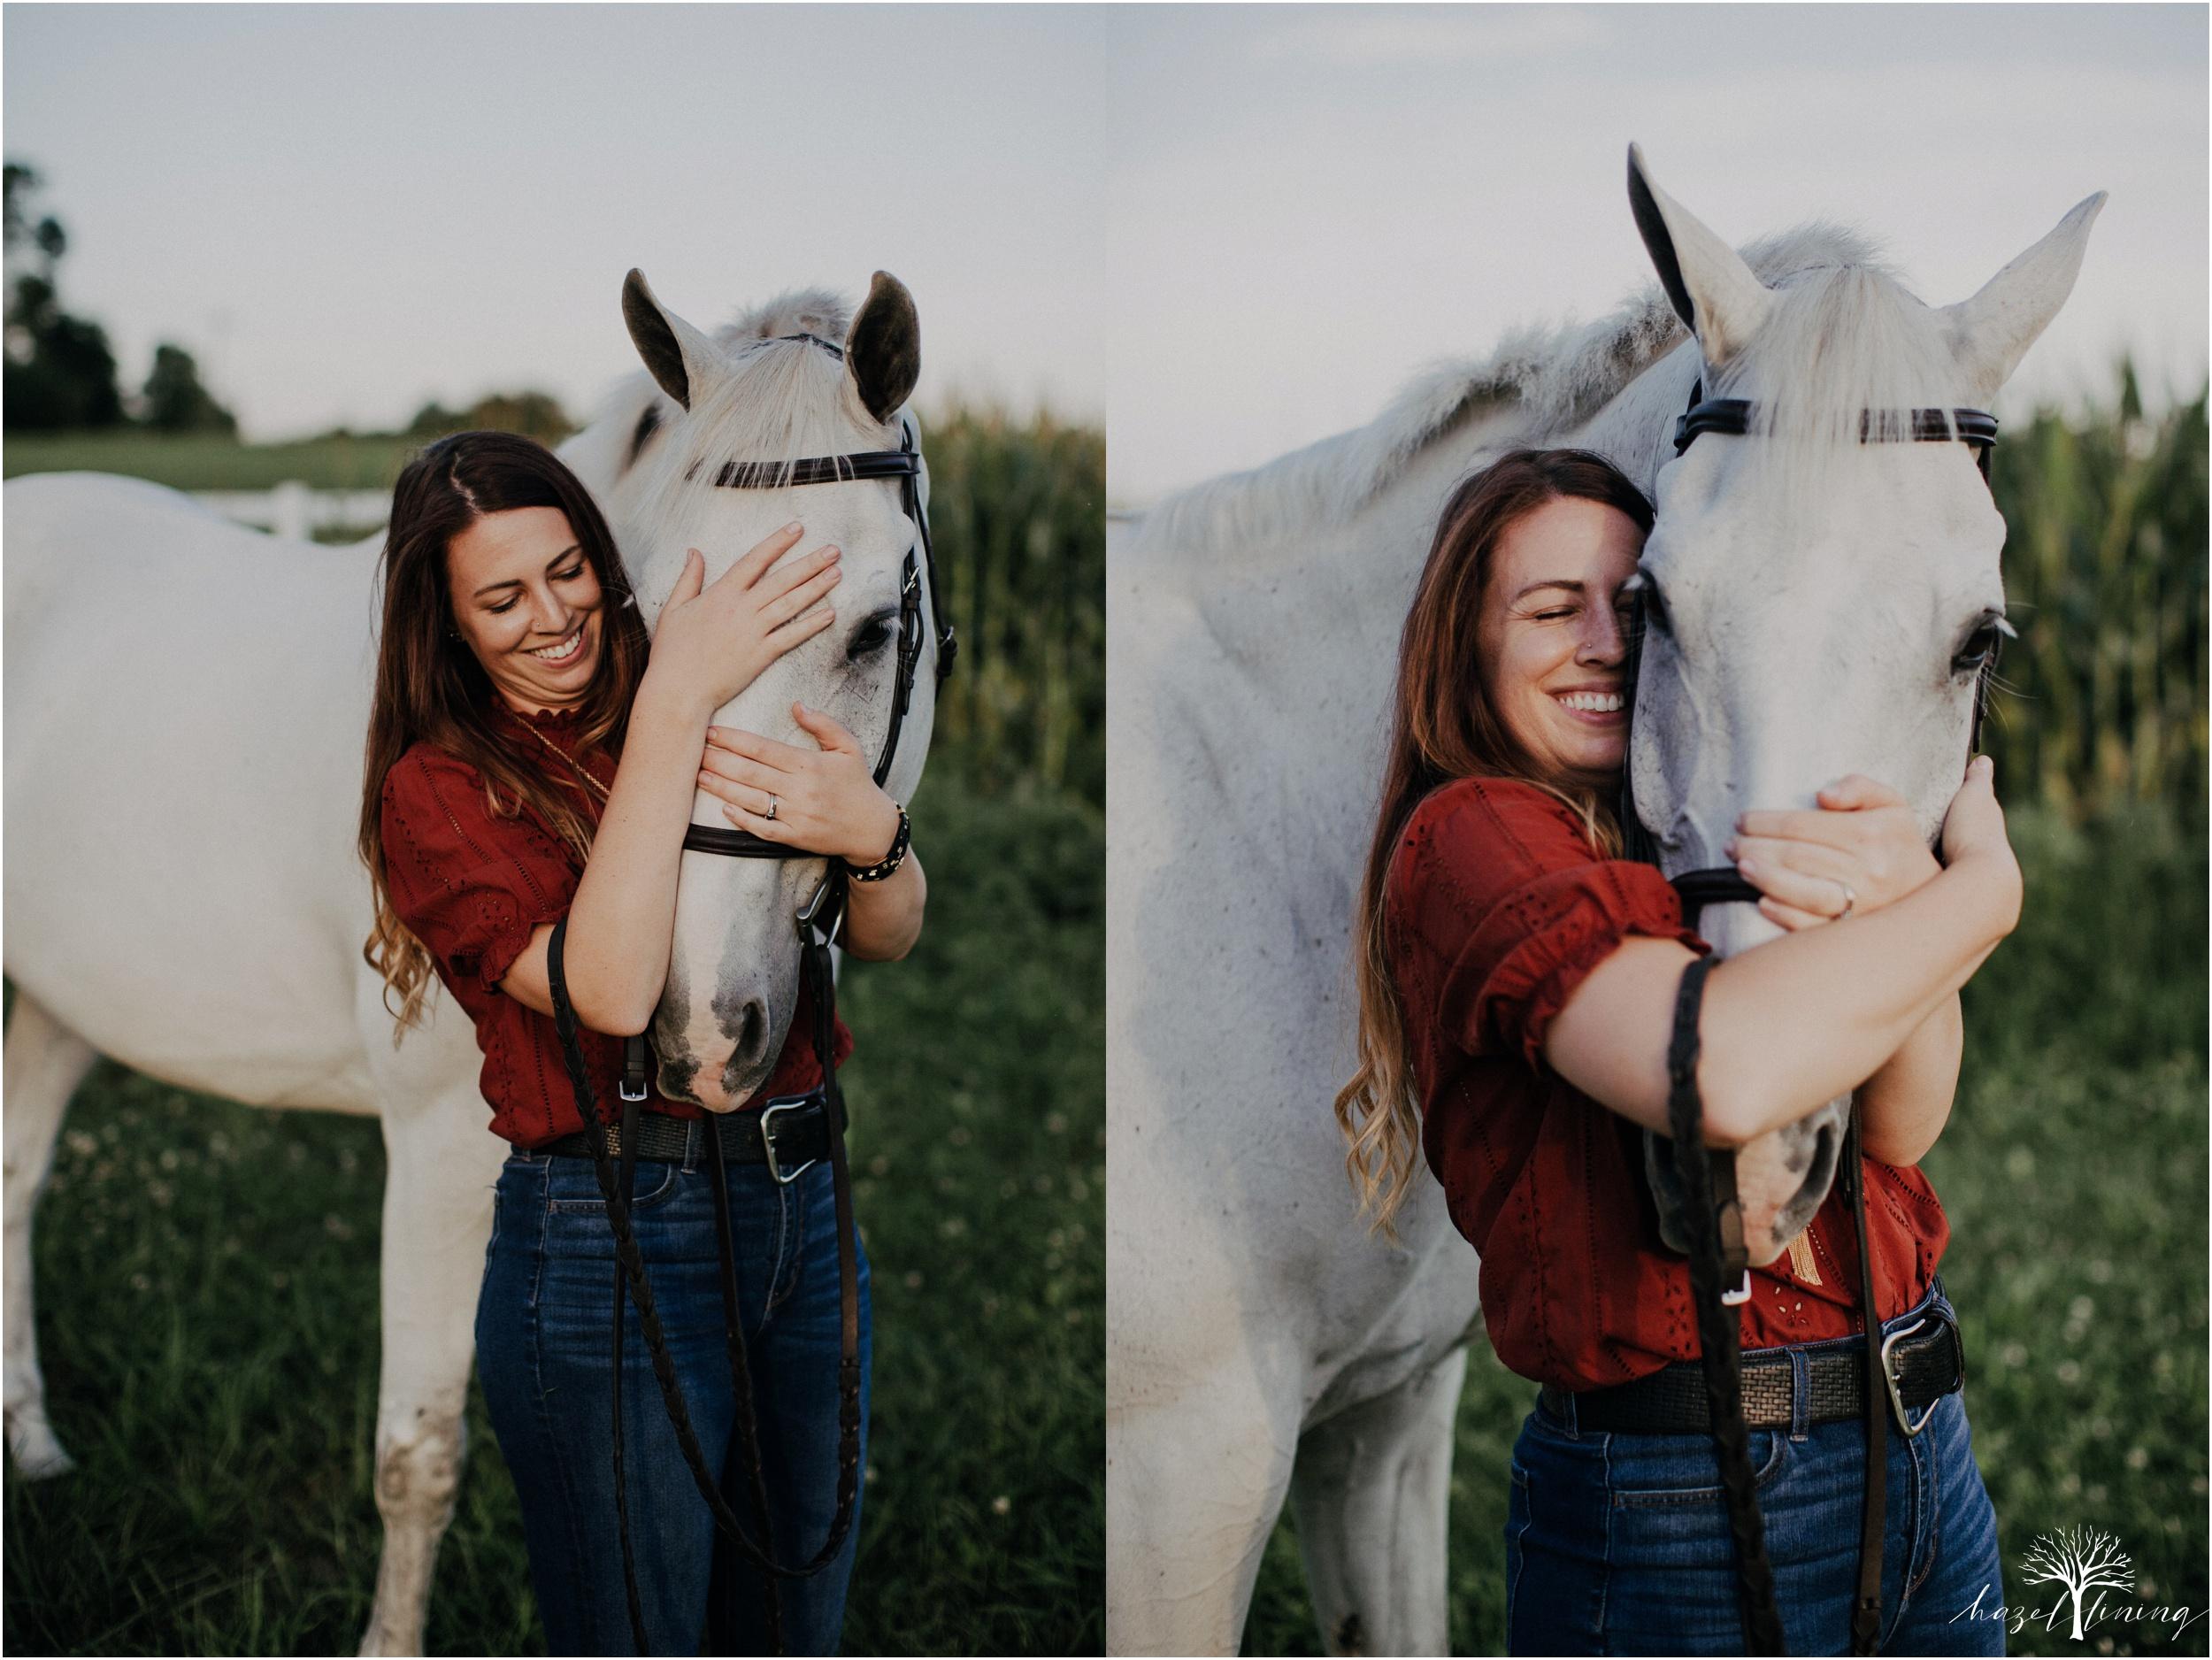 taylor-adams-and-horse-delaware-valley-university-delval-summer-equestrian-portrait-session-hazel-lining-photography-destination-elopement-wedding-engagement-photography_0026.jpg